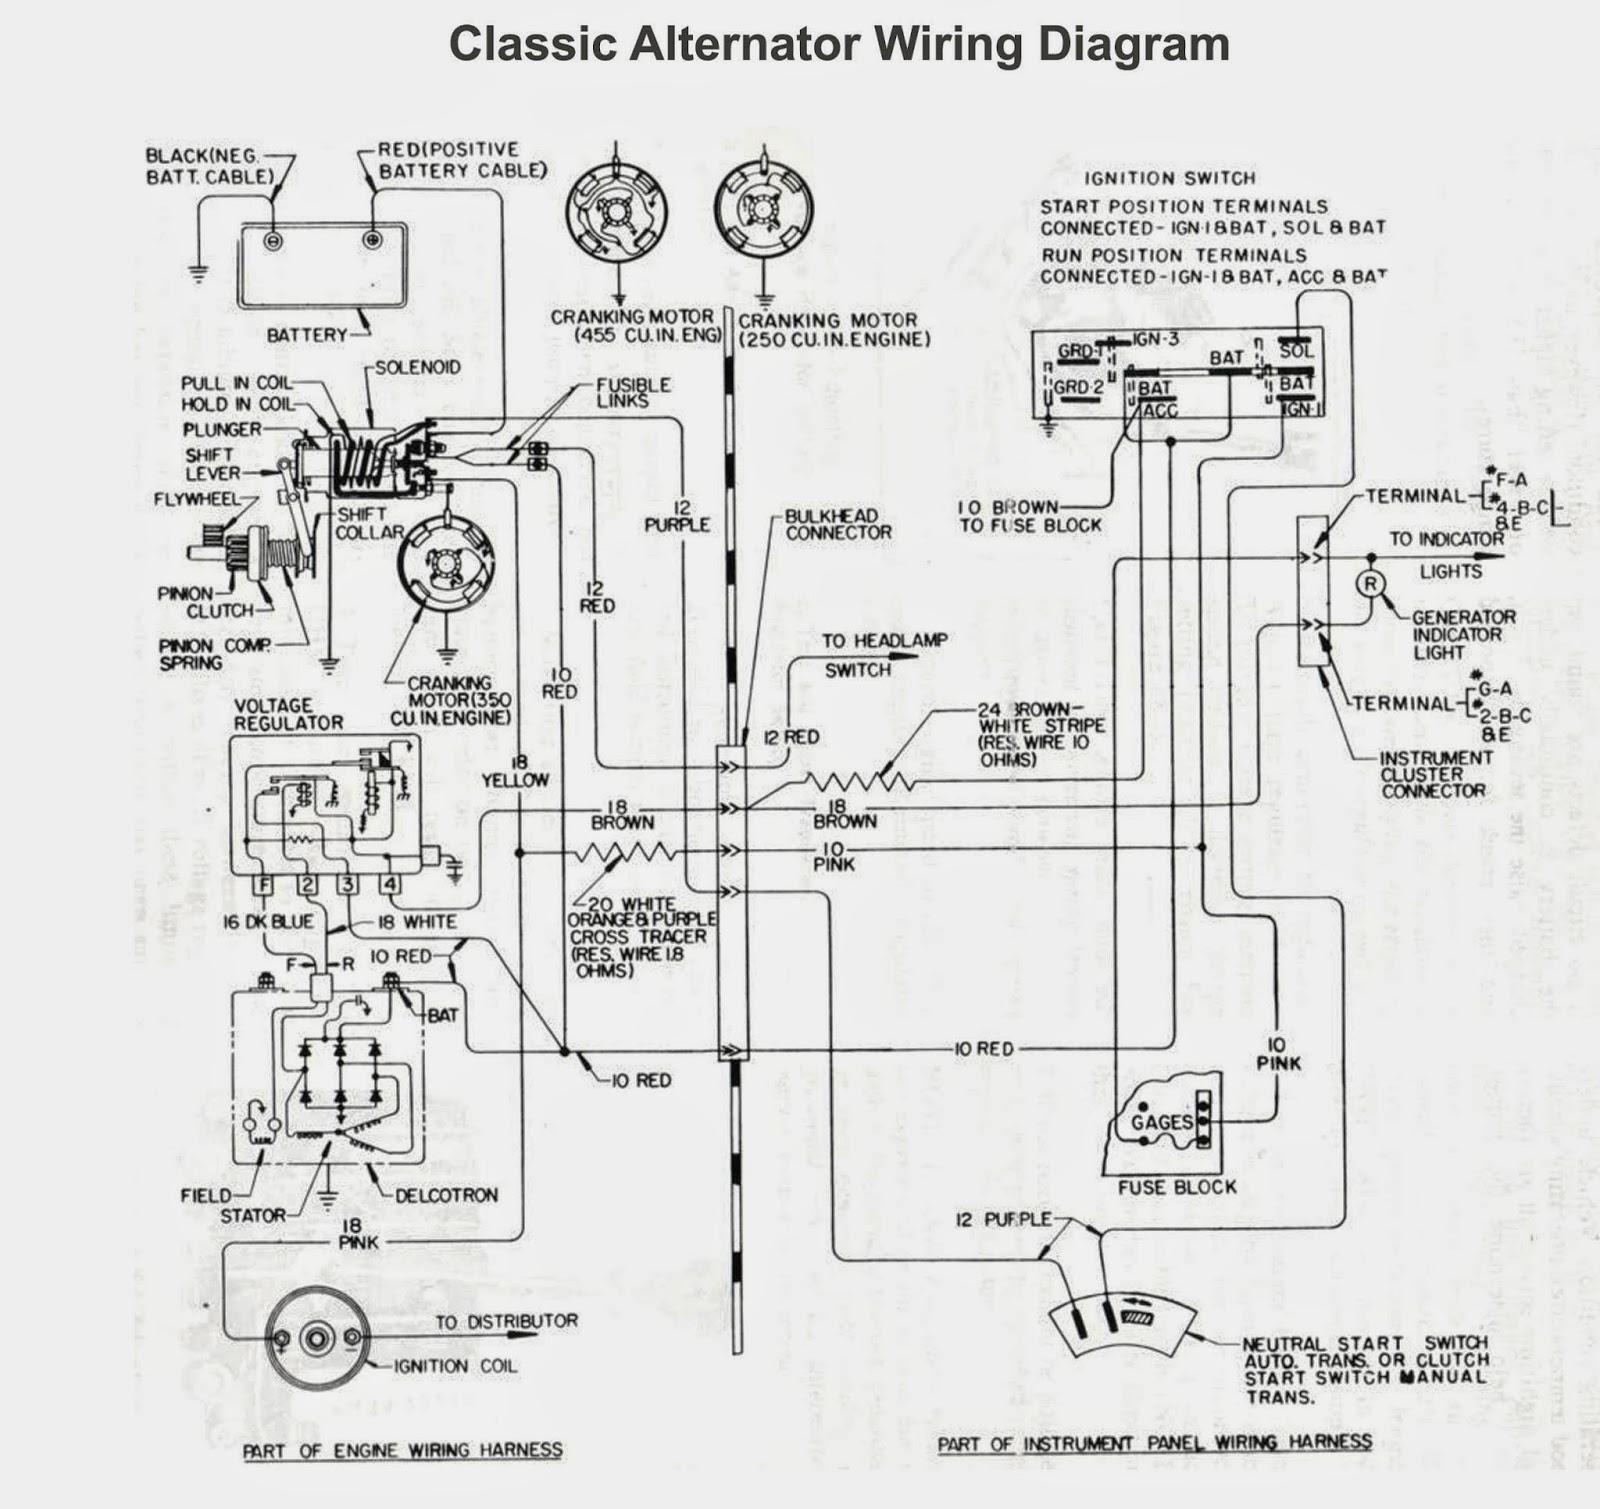 Untitled 1?resize=665%2C627 cat generator wiring diagrams wiring diagram iMac Desktop A1311 at bayanpartner.co